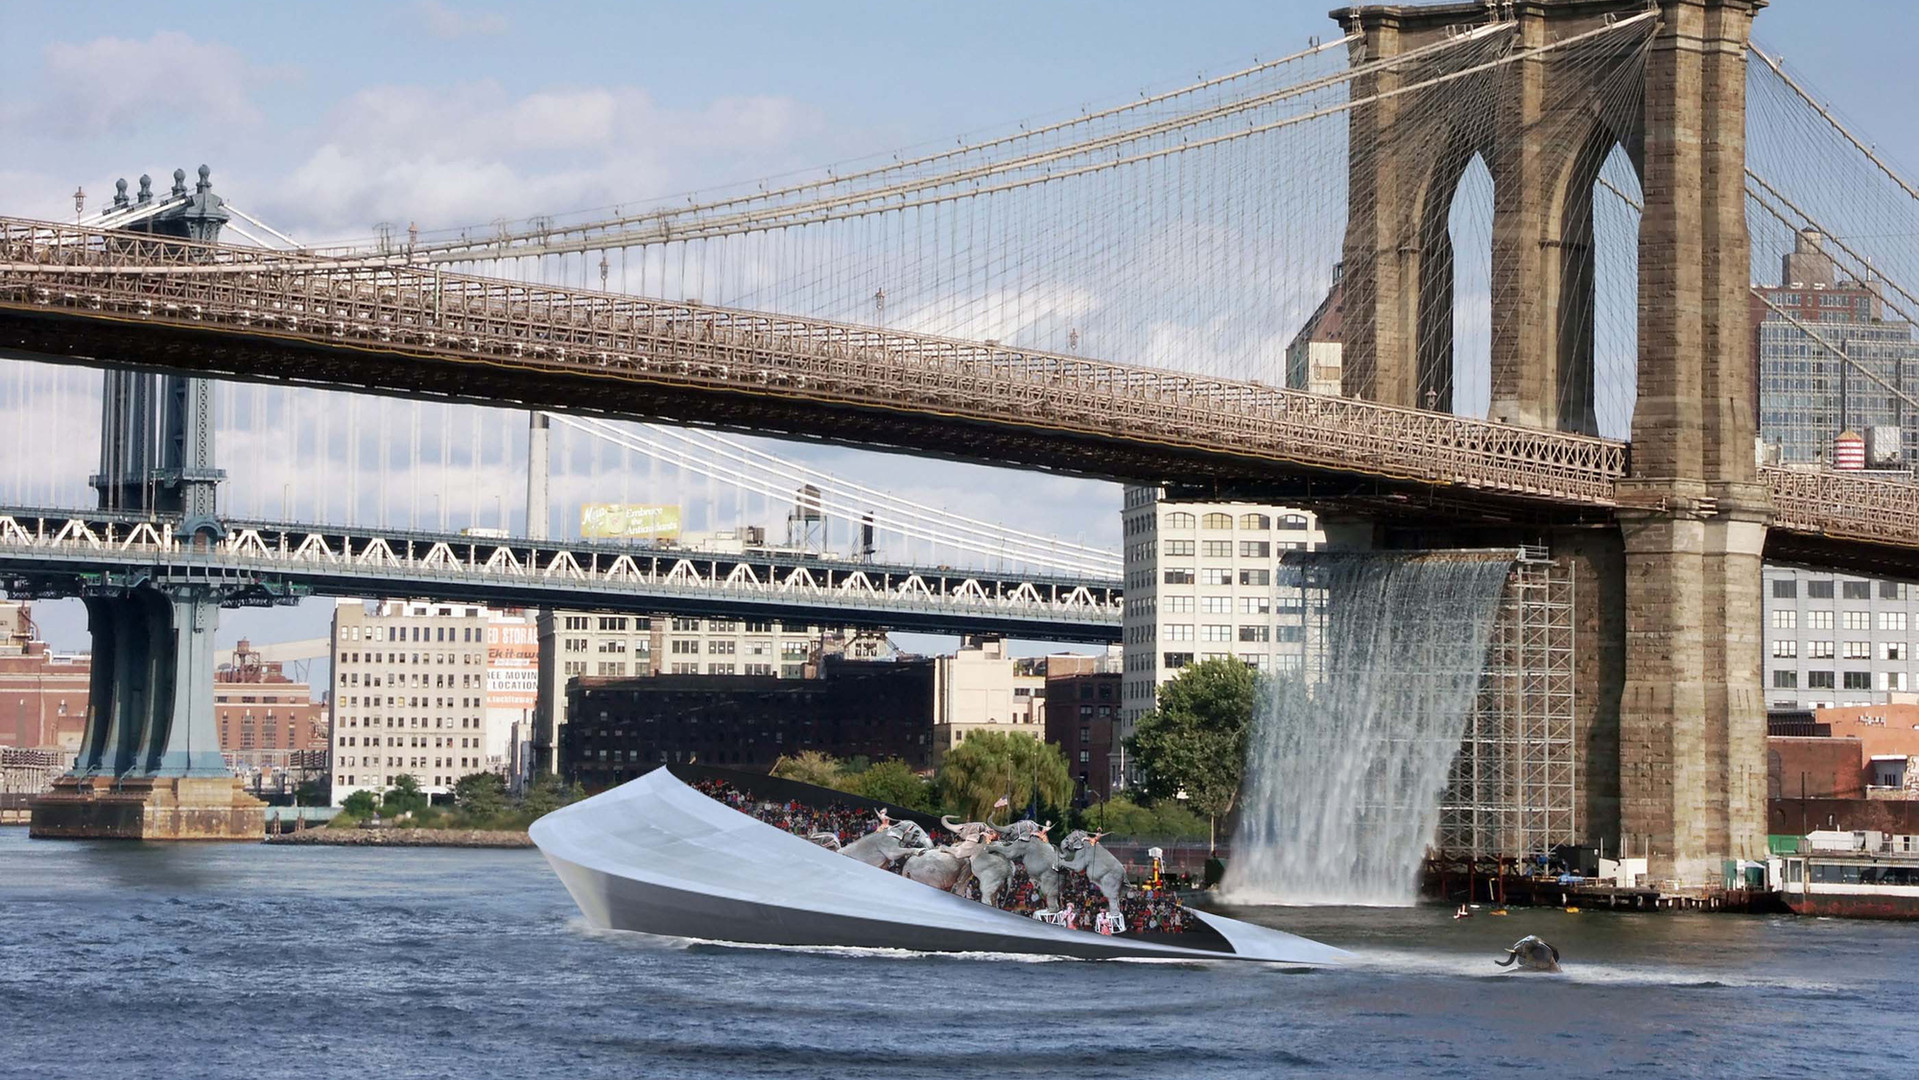 Mobius Boat_102.jpg